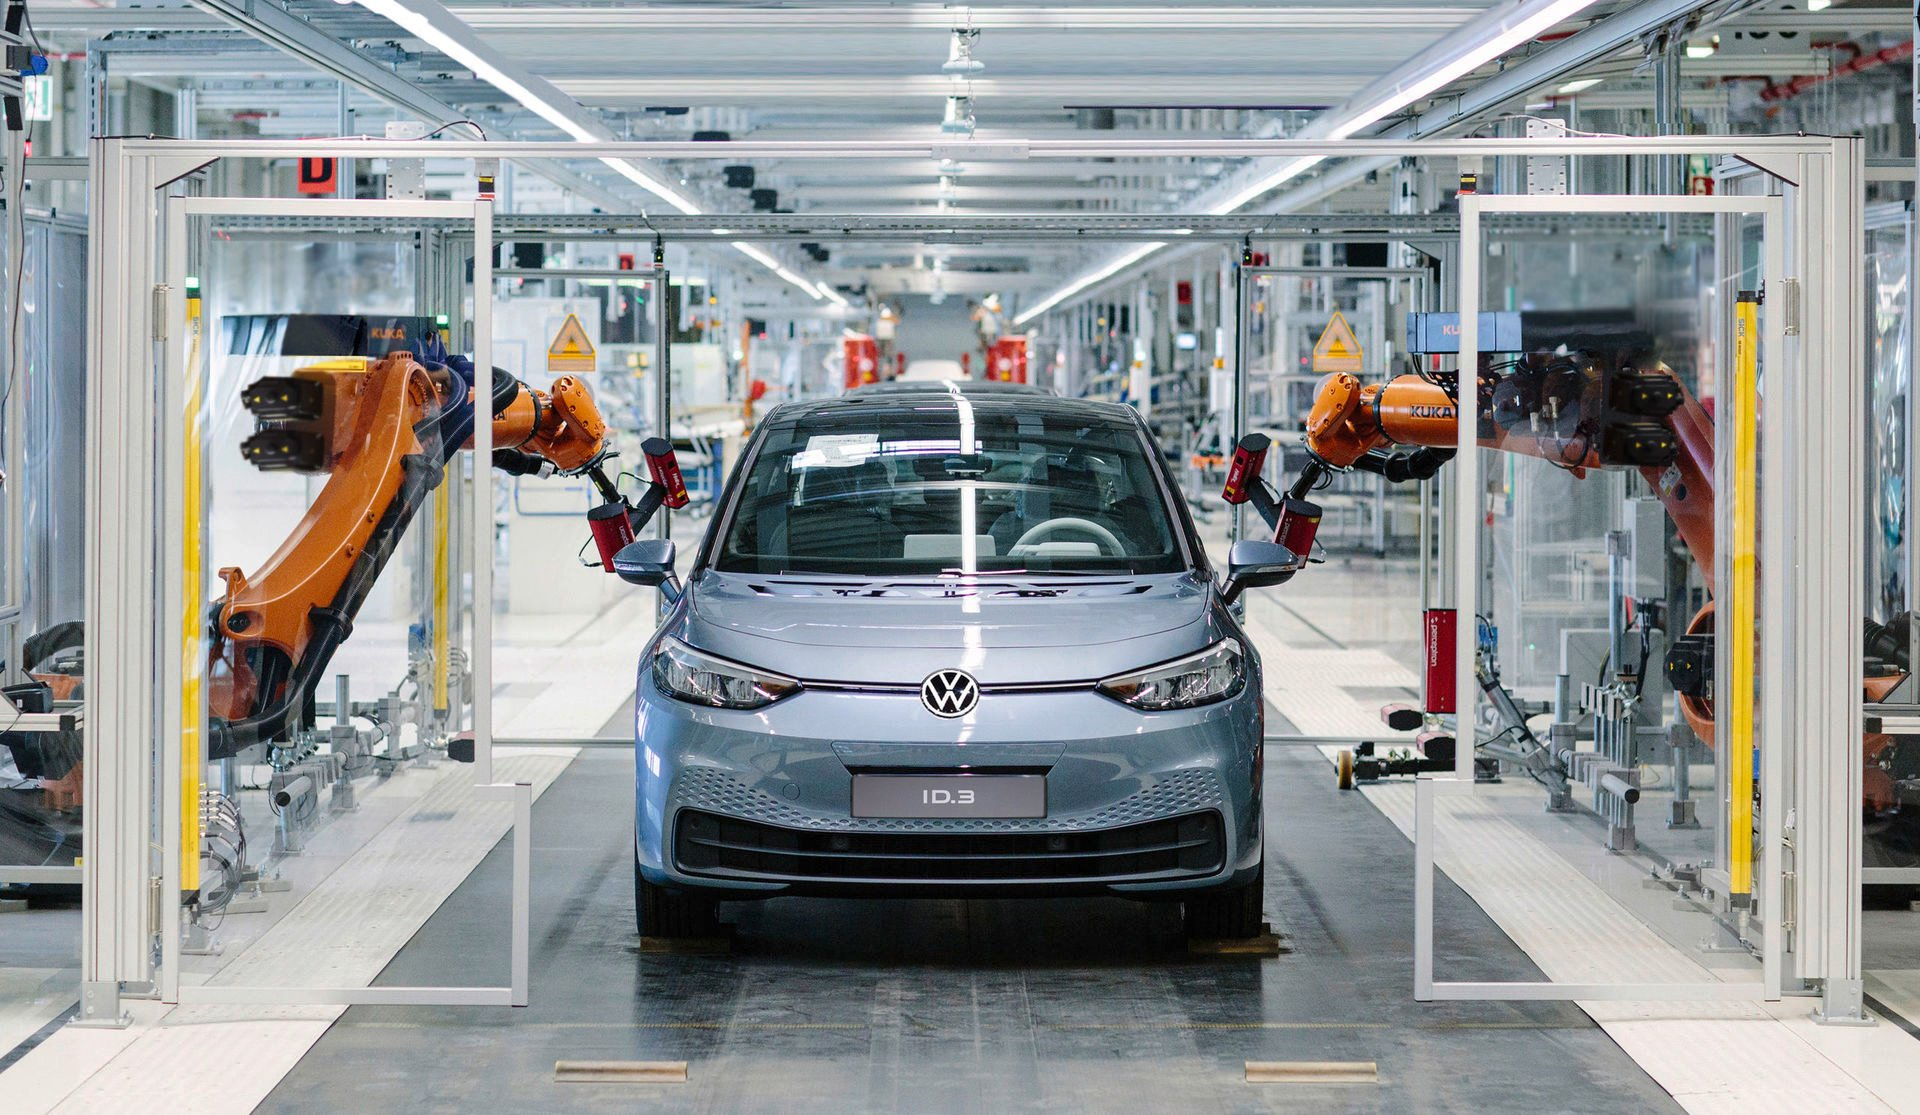 Výroba Volkswagen ID.3